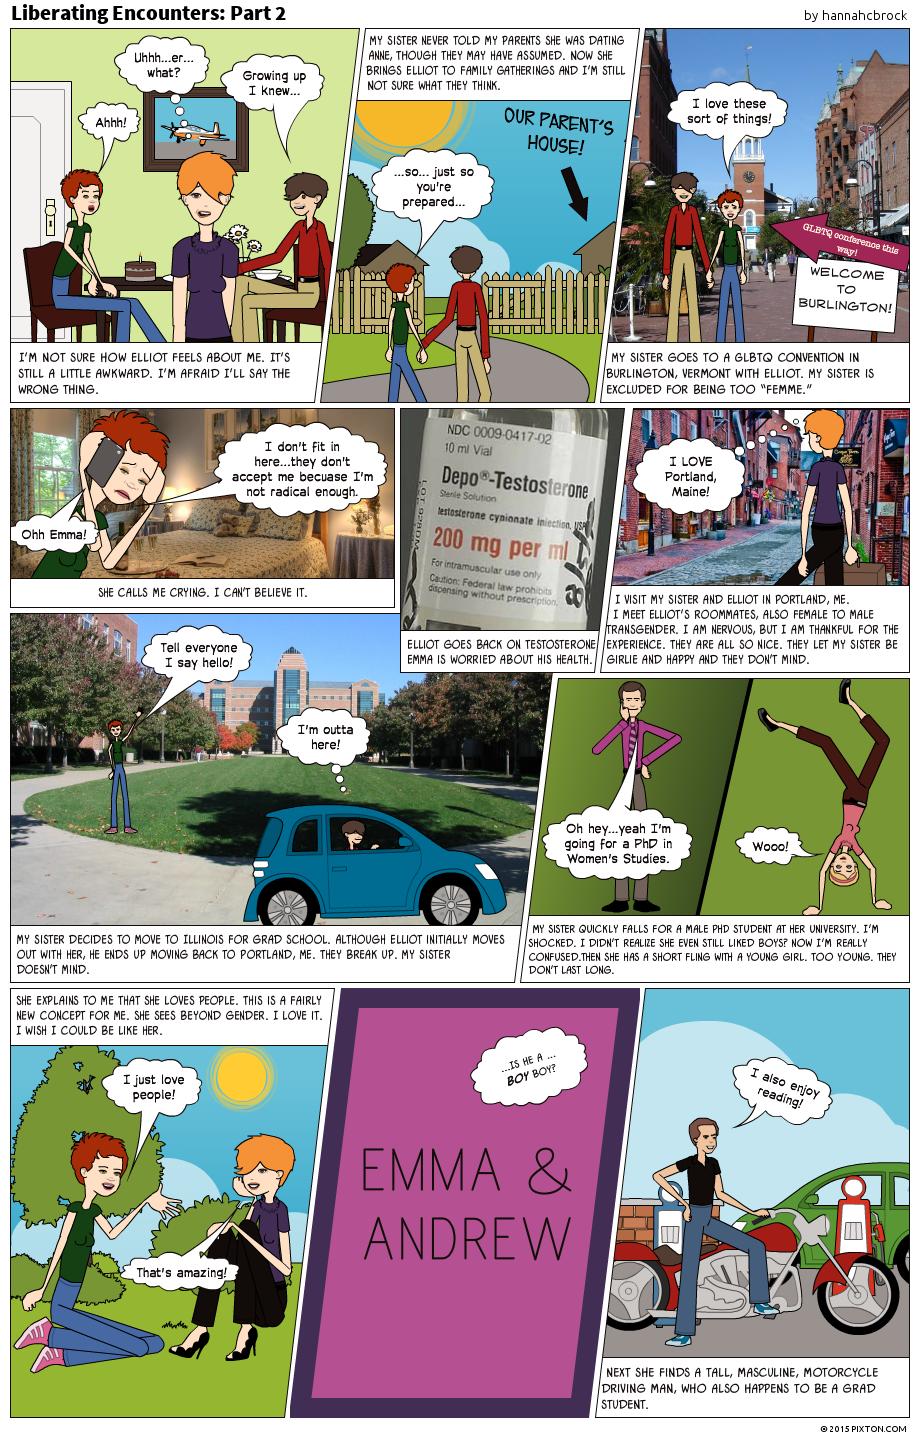 Pixton_Comic_Liberating_Encounters_Part_2_by_hannahcbrock